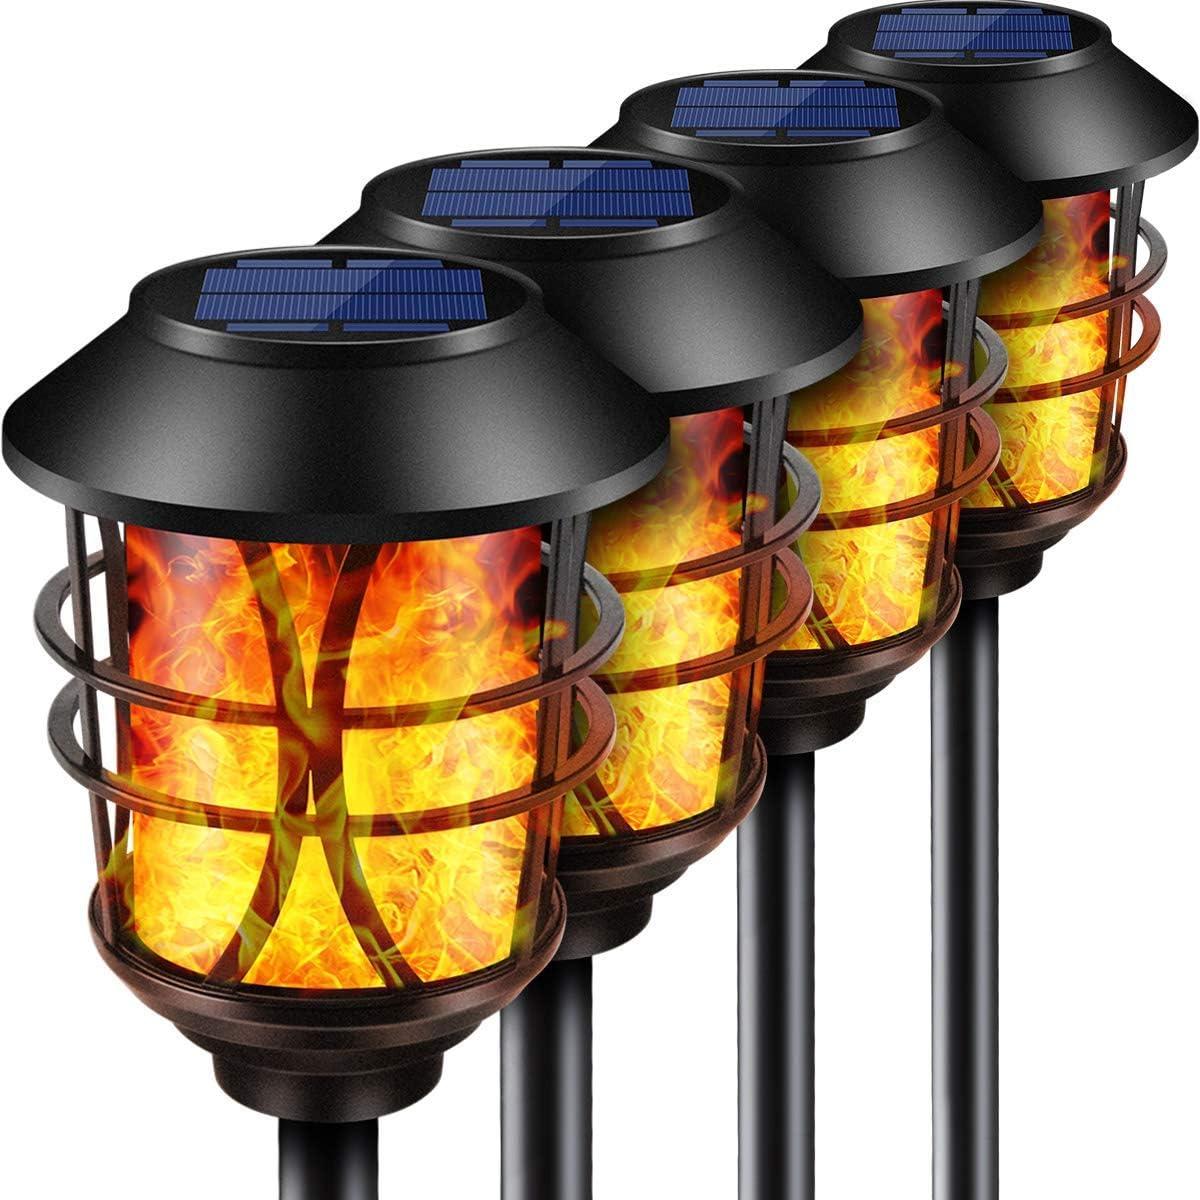 LETMY Solar Lights Outdoor Metal Flickering Flame Solar Garden Lights Waterproof Heavy Duty Solar Torch Lights Dusk to Dawn Auto On//Off for Garden Patio Yard